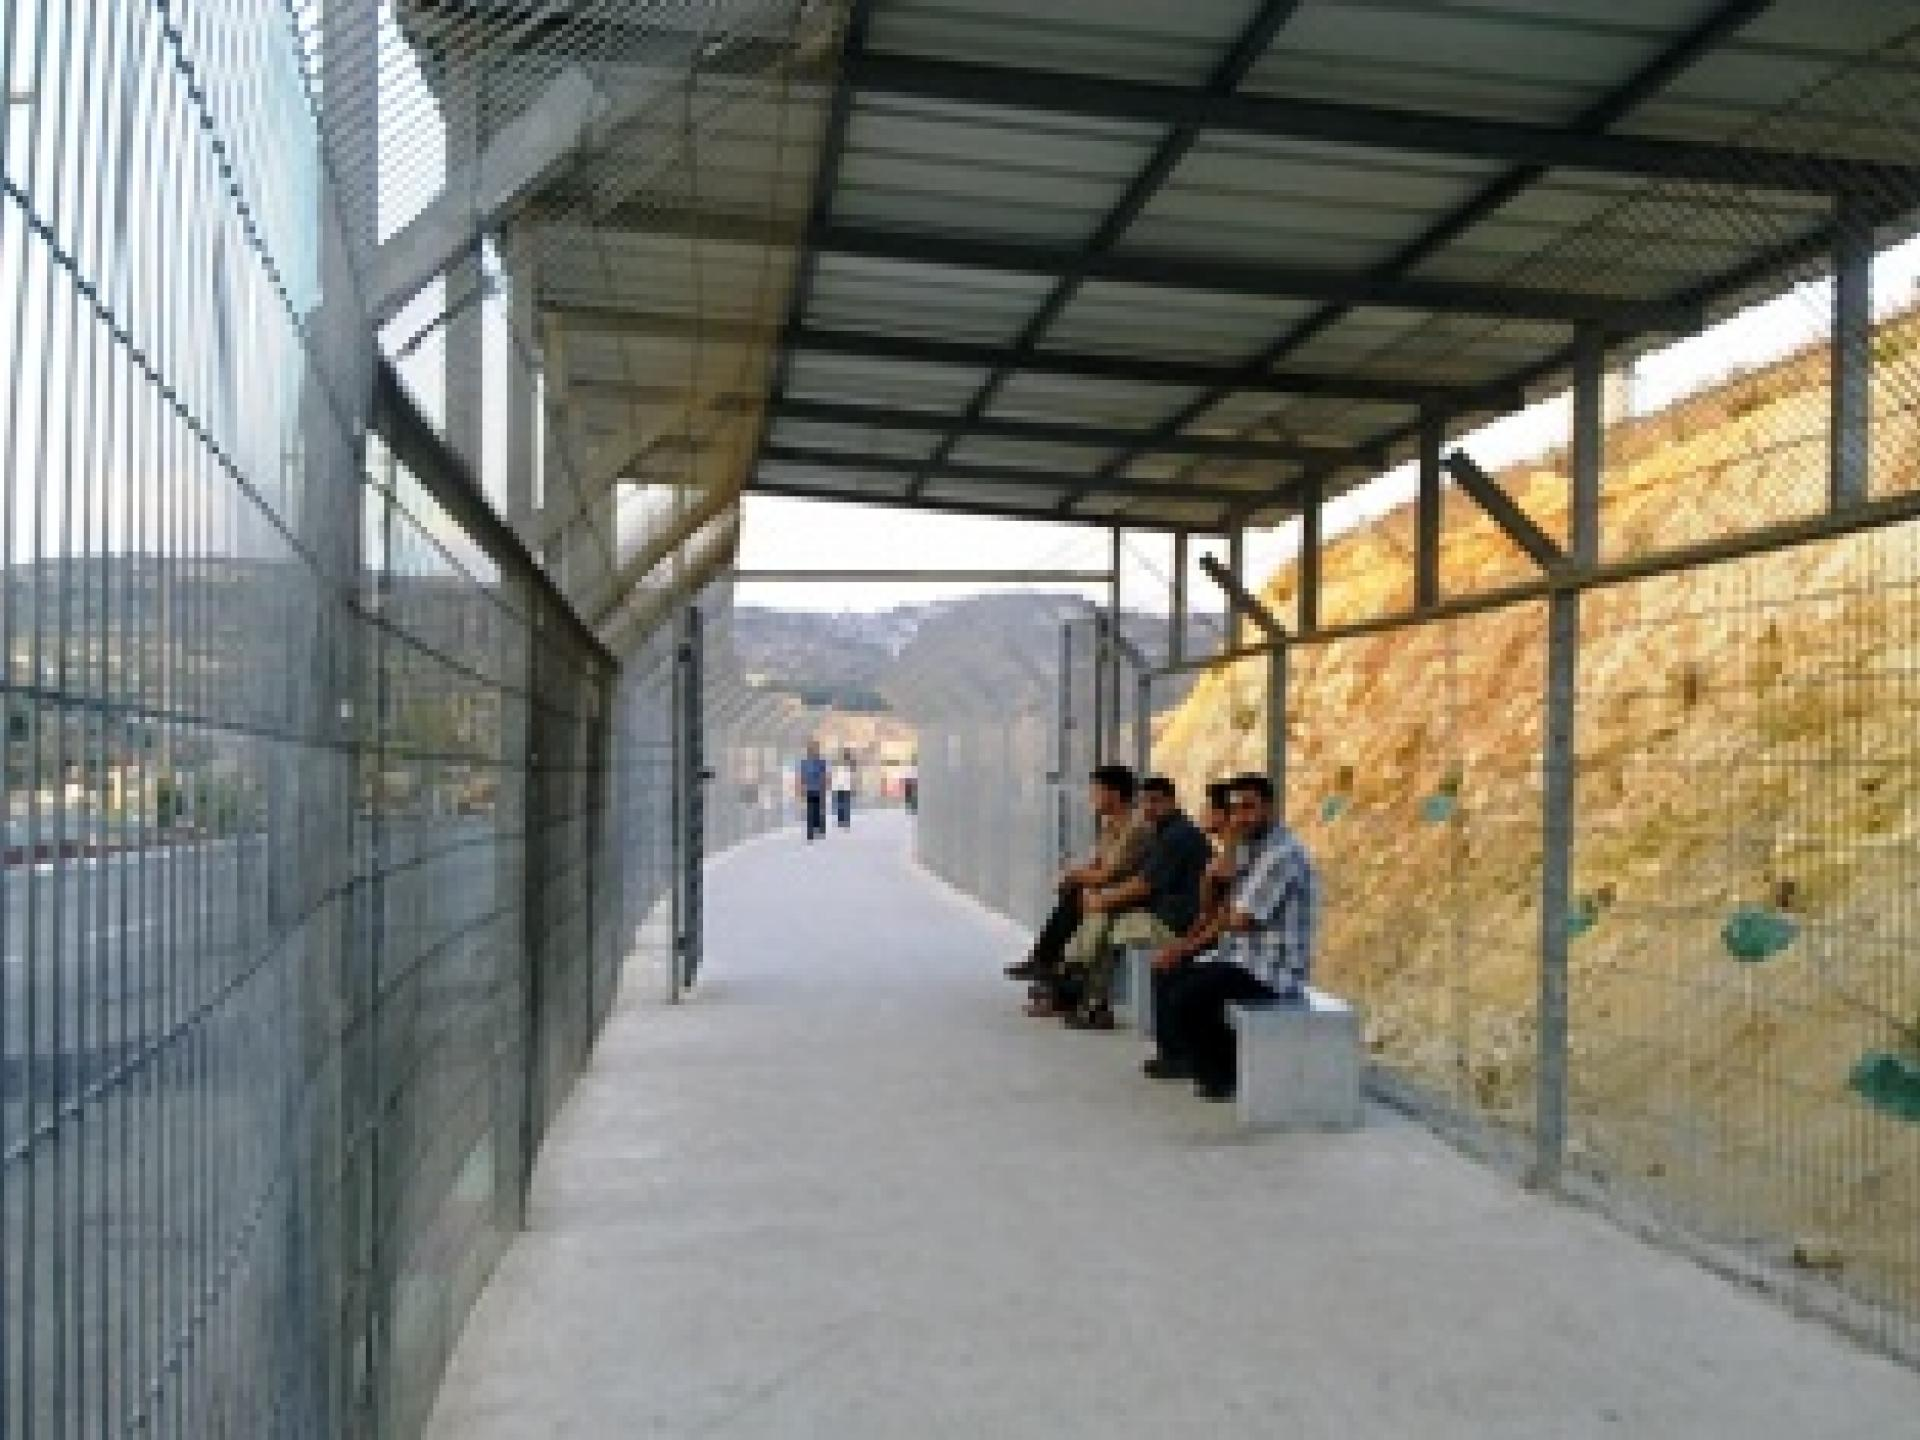 Barta'a/Reikhan checkpoint 26.08.10